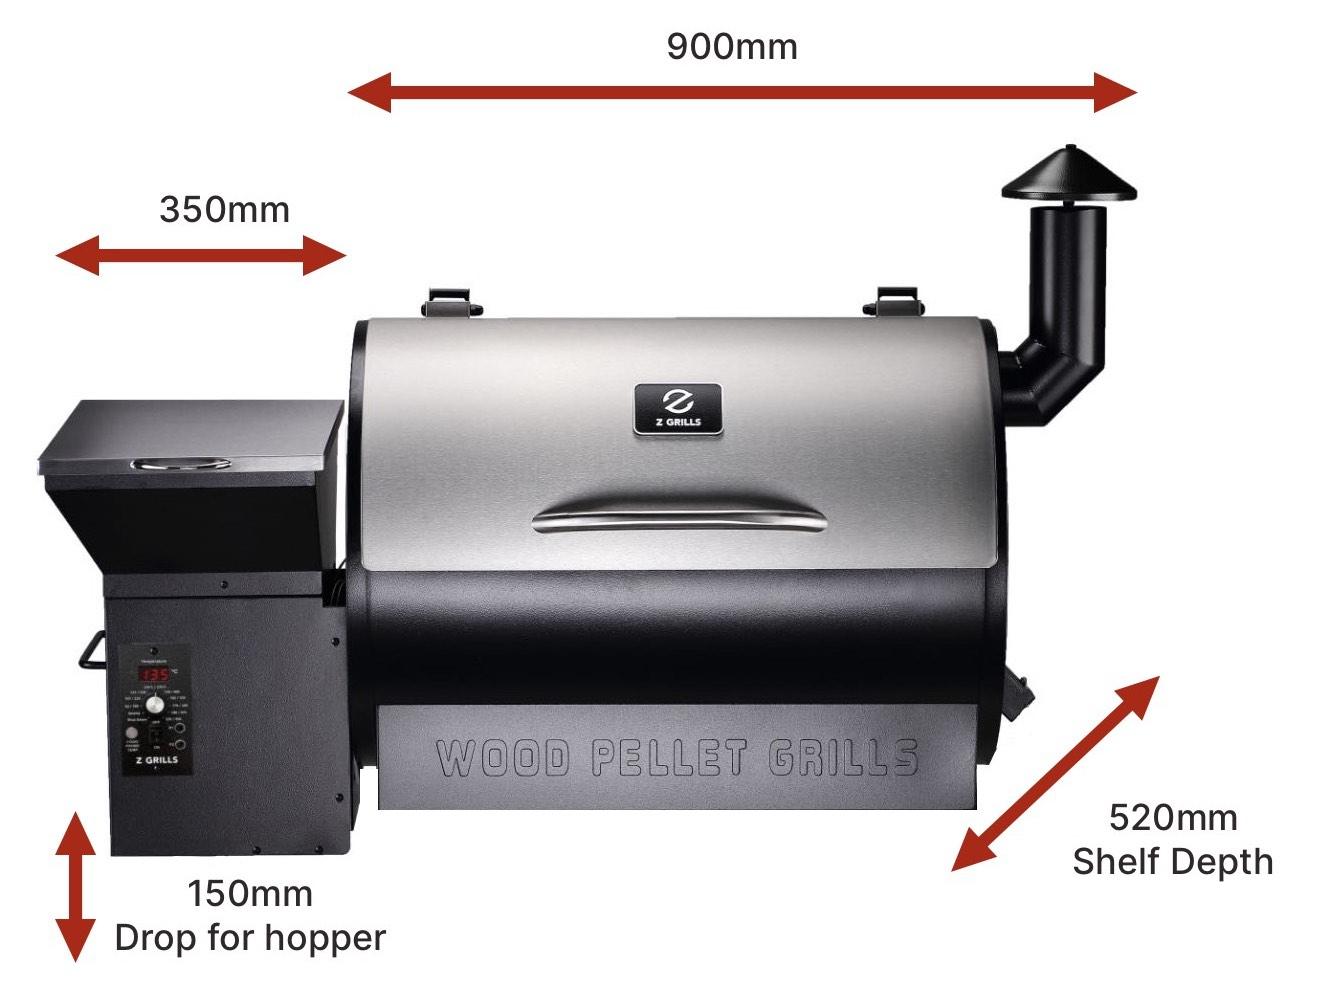 Z Grills 700E-XL Pellets Smoker Built in BBQ Dimensions